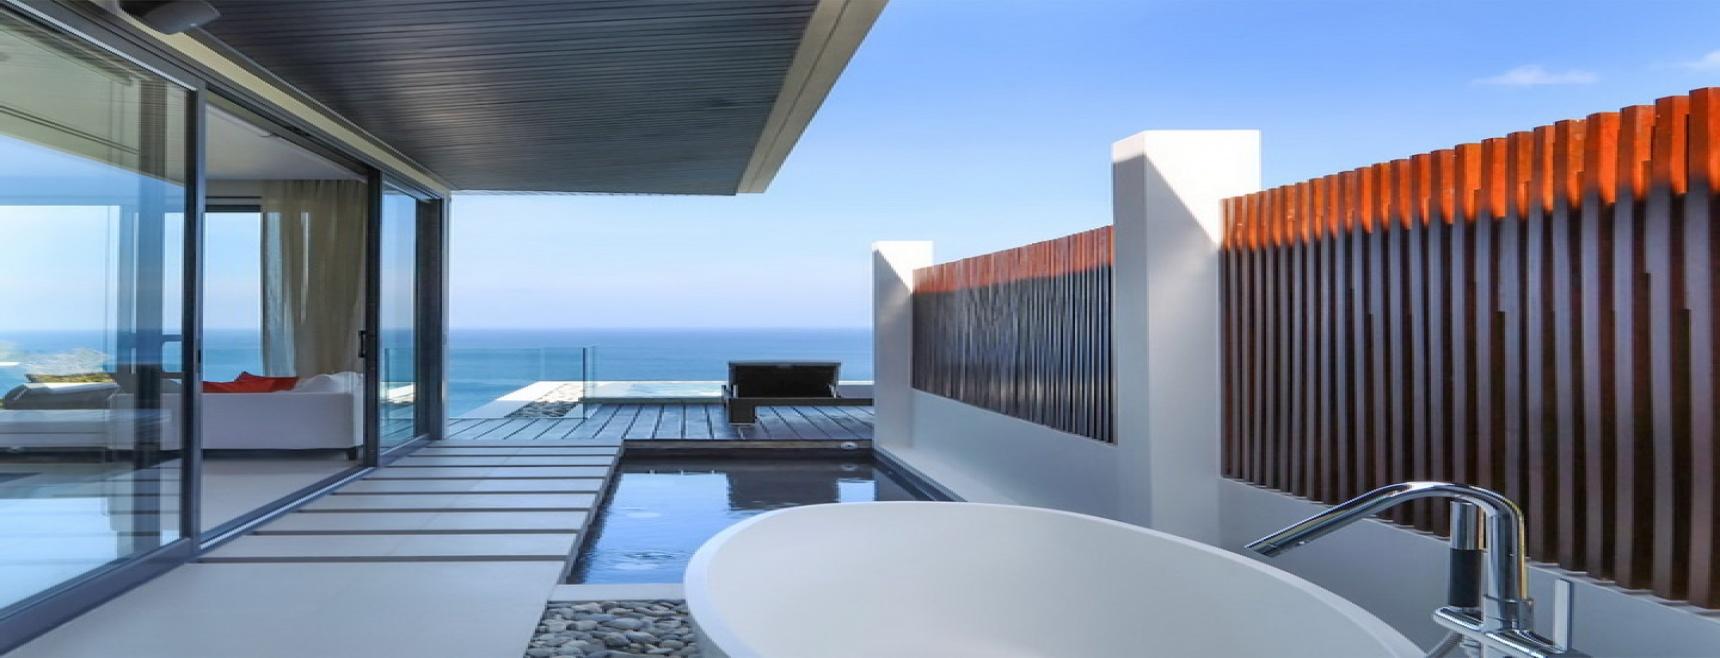 Saan Cape Amarin 8 Bedroom(Thai-Real.com)